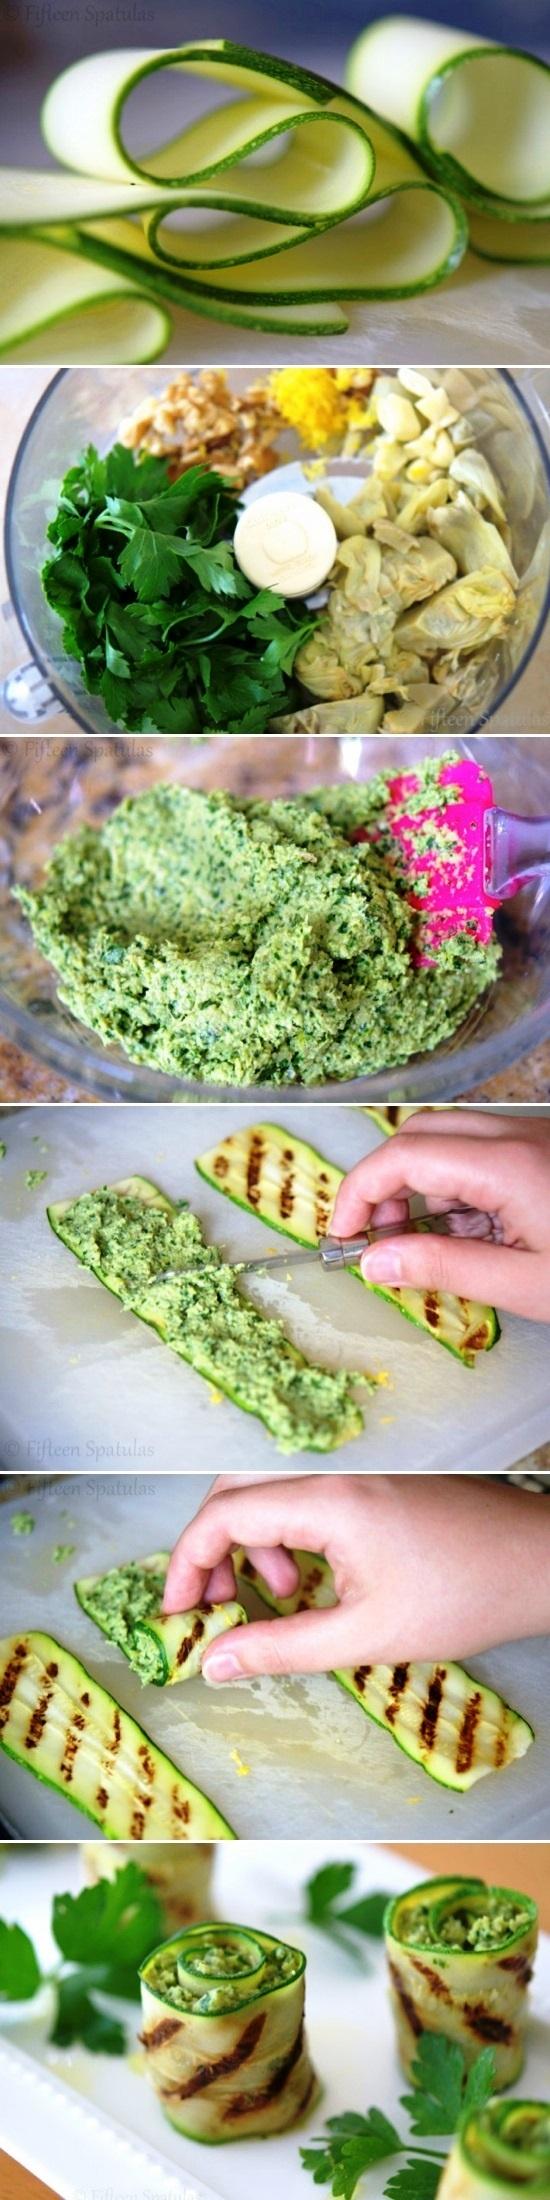 Grilled zucchini artichoke pesto bites